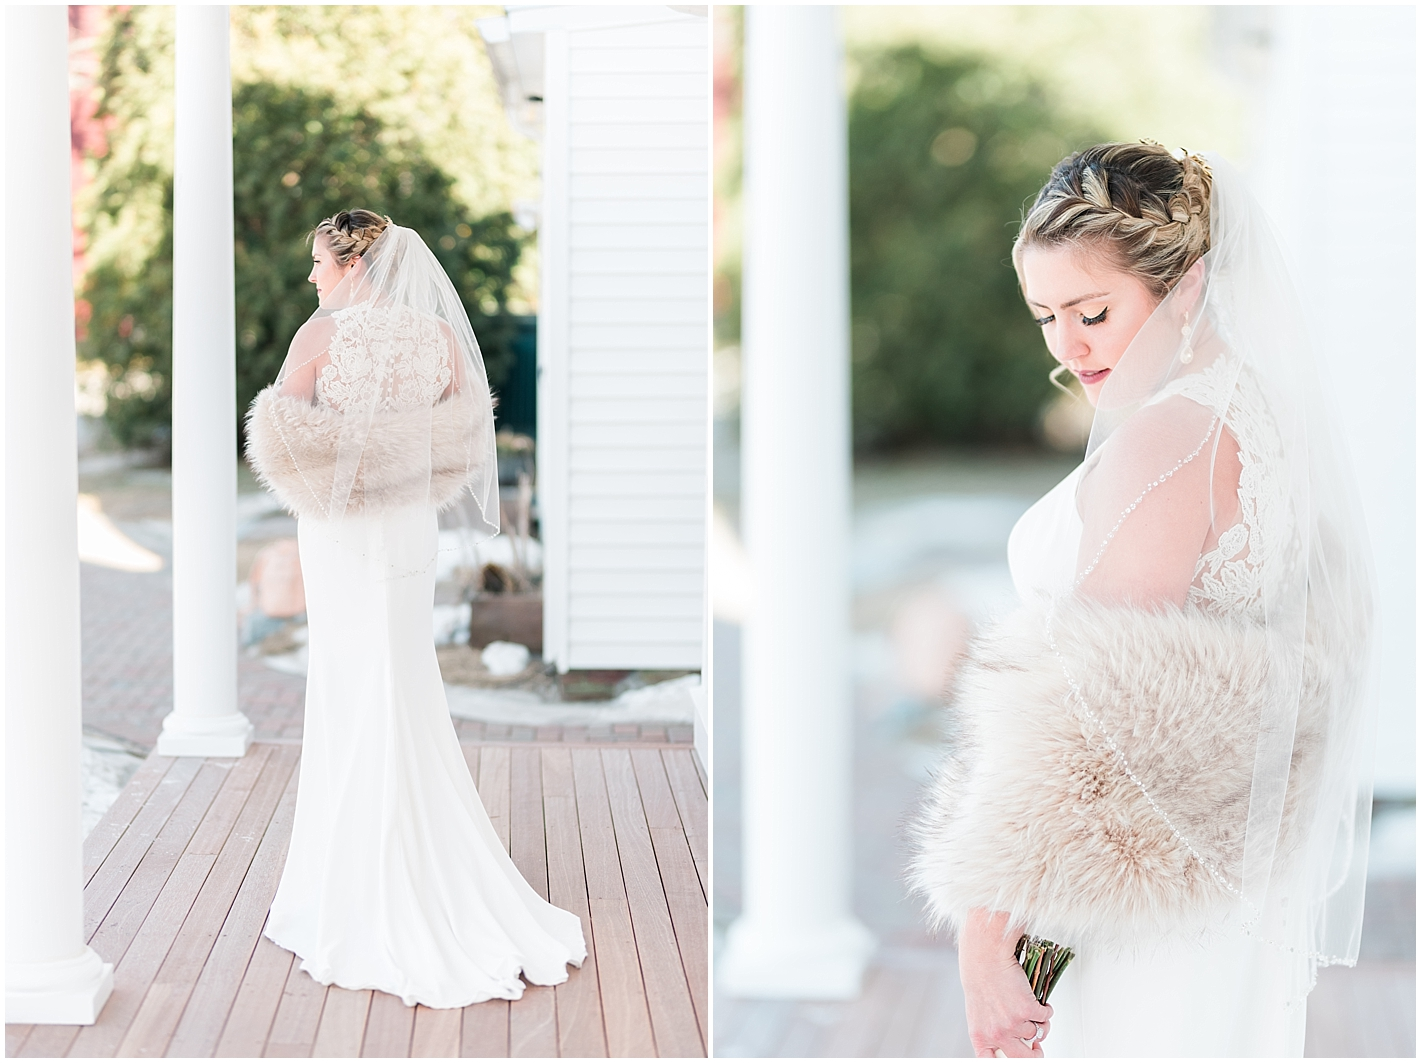 Winter Wedding Bride Portraits by Alyssa Parker Photography